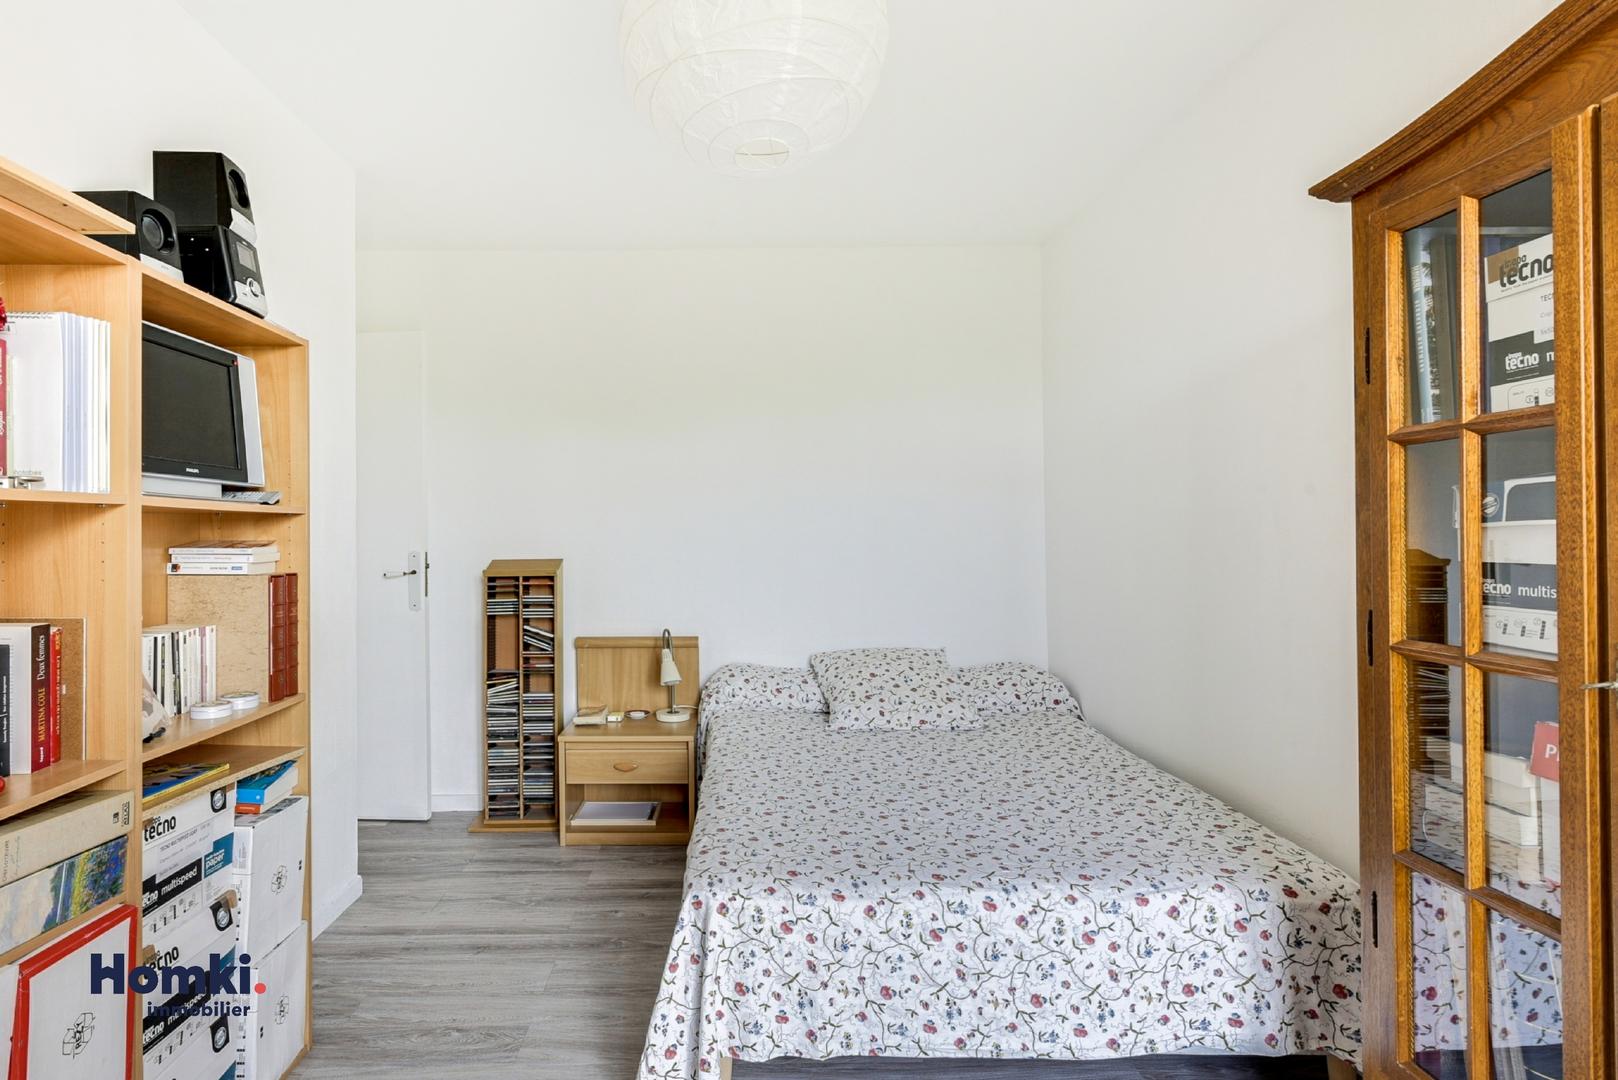 Vente appartement MArseille 13010 T5_9